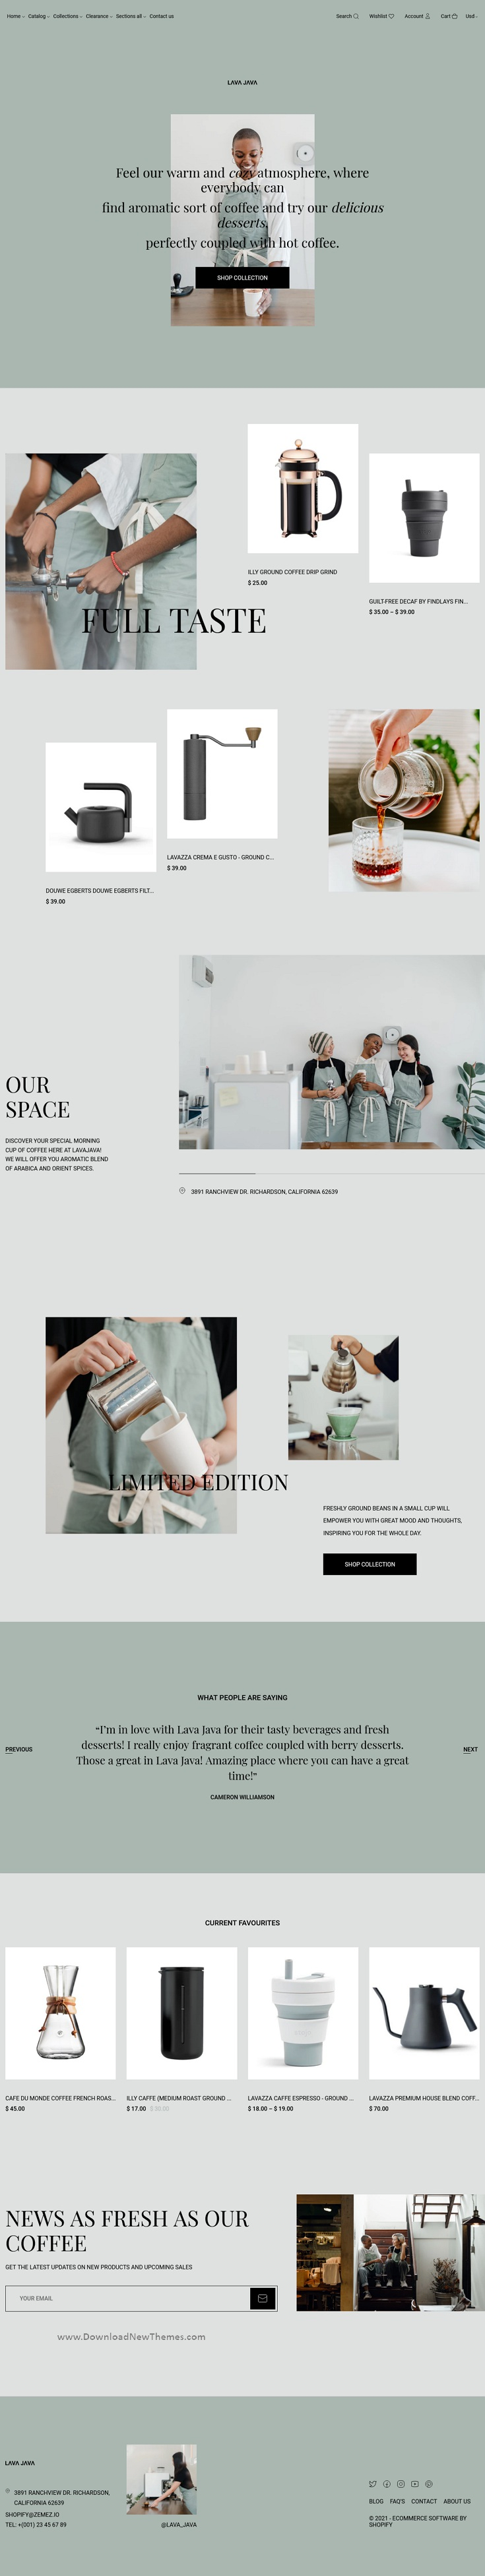 Lava Java Shopify Coffee Shop Theme for Barista